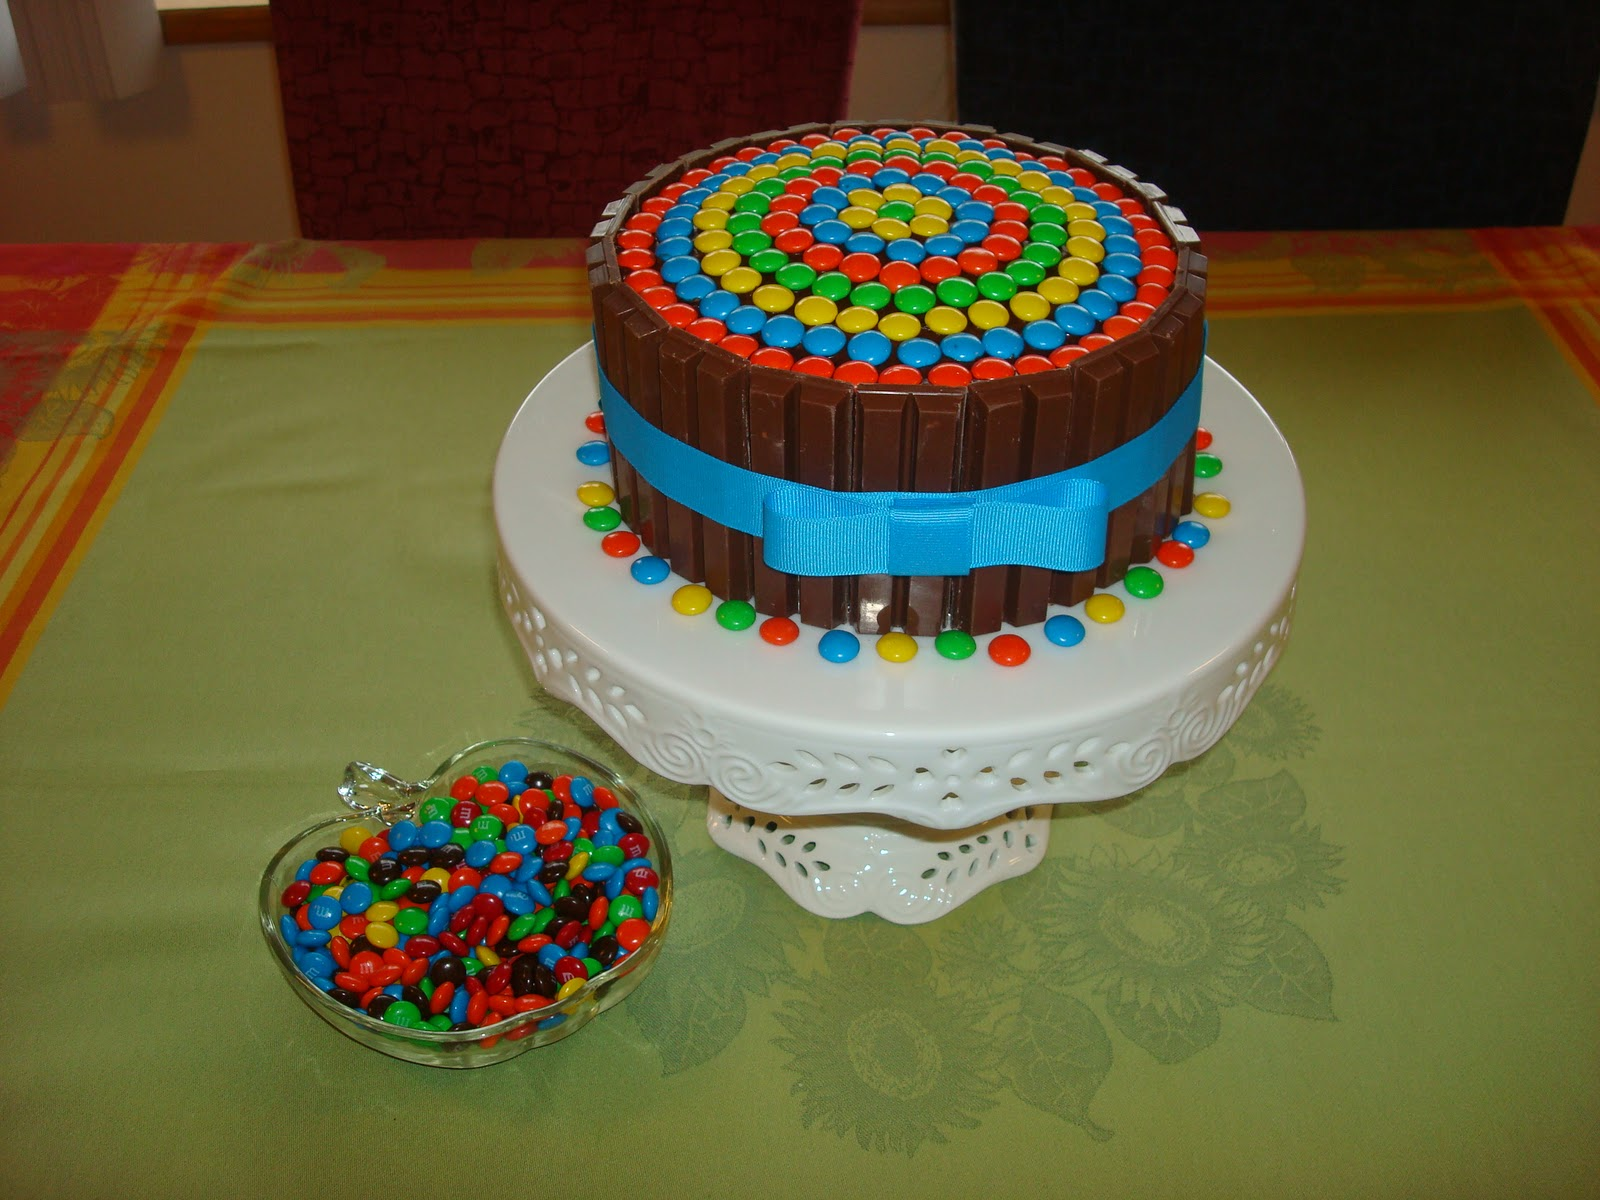 10 Year Old Birthday Cake Ideas For Boys Via Under Construction